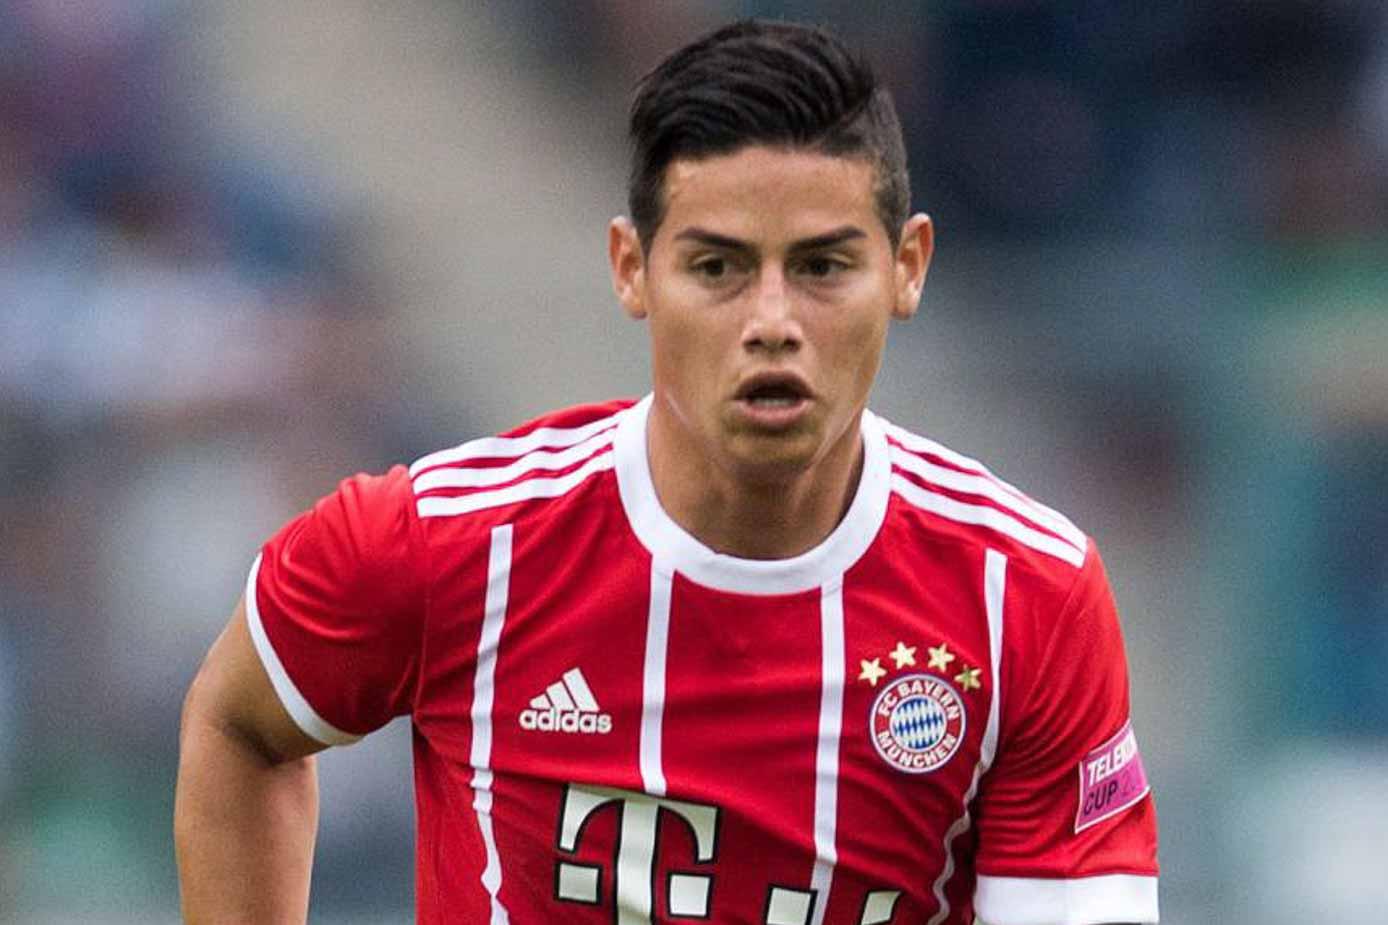 detailed look 6b284 1d7d4 James Rodriguez Jersey - FC Bayern & Colombia - SoccerPro.com